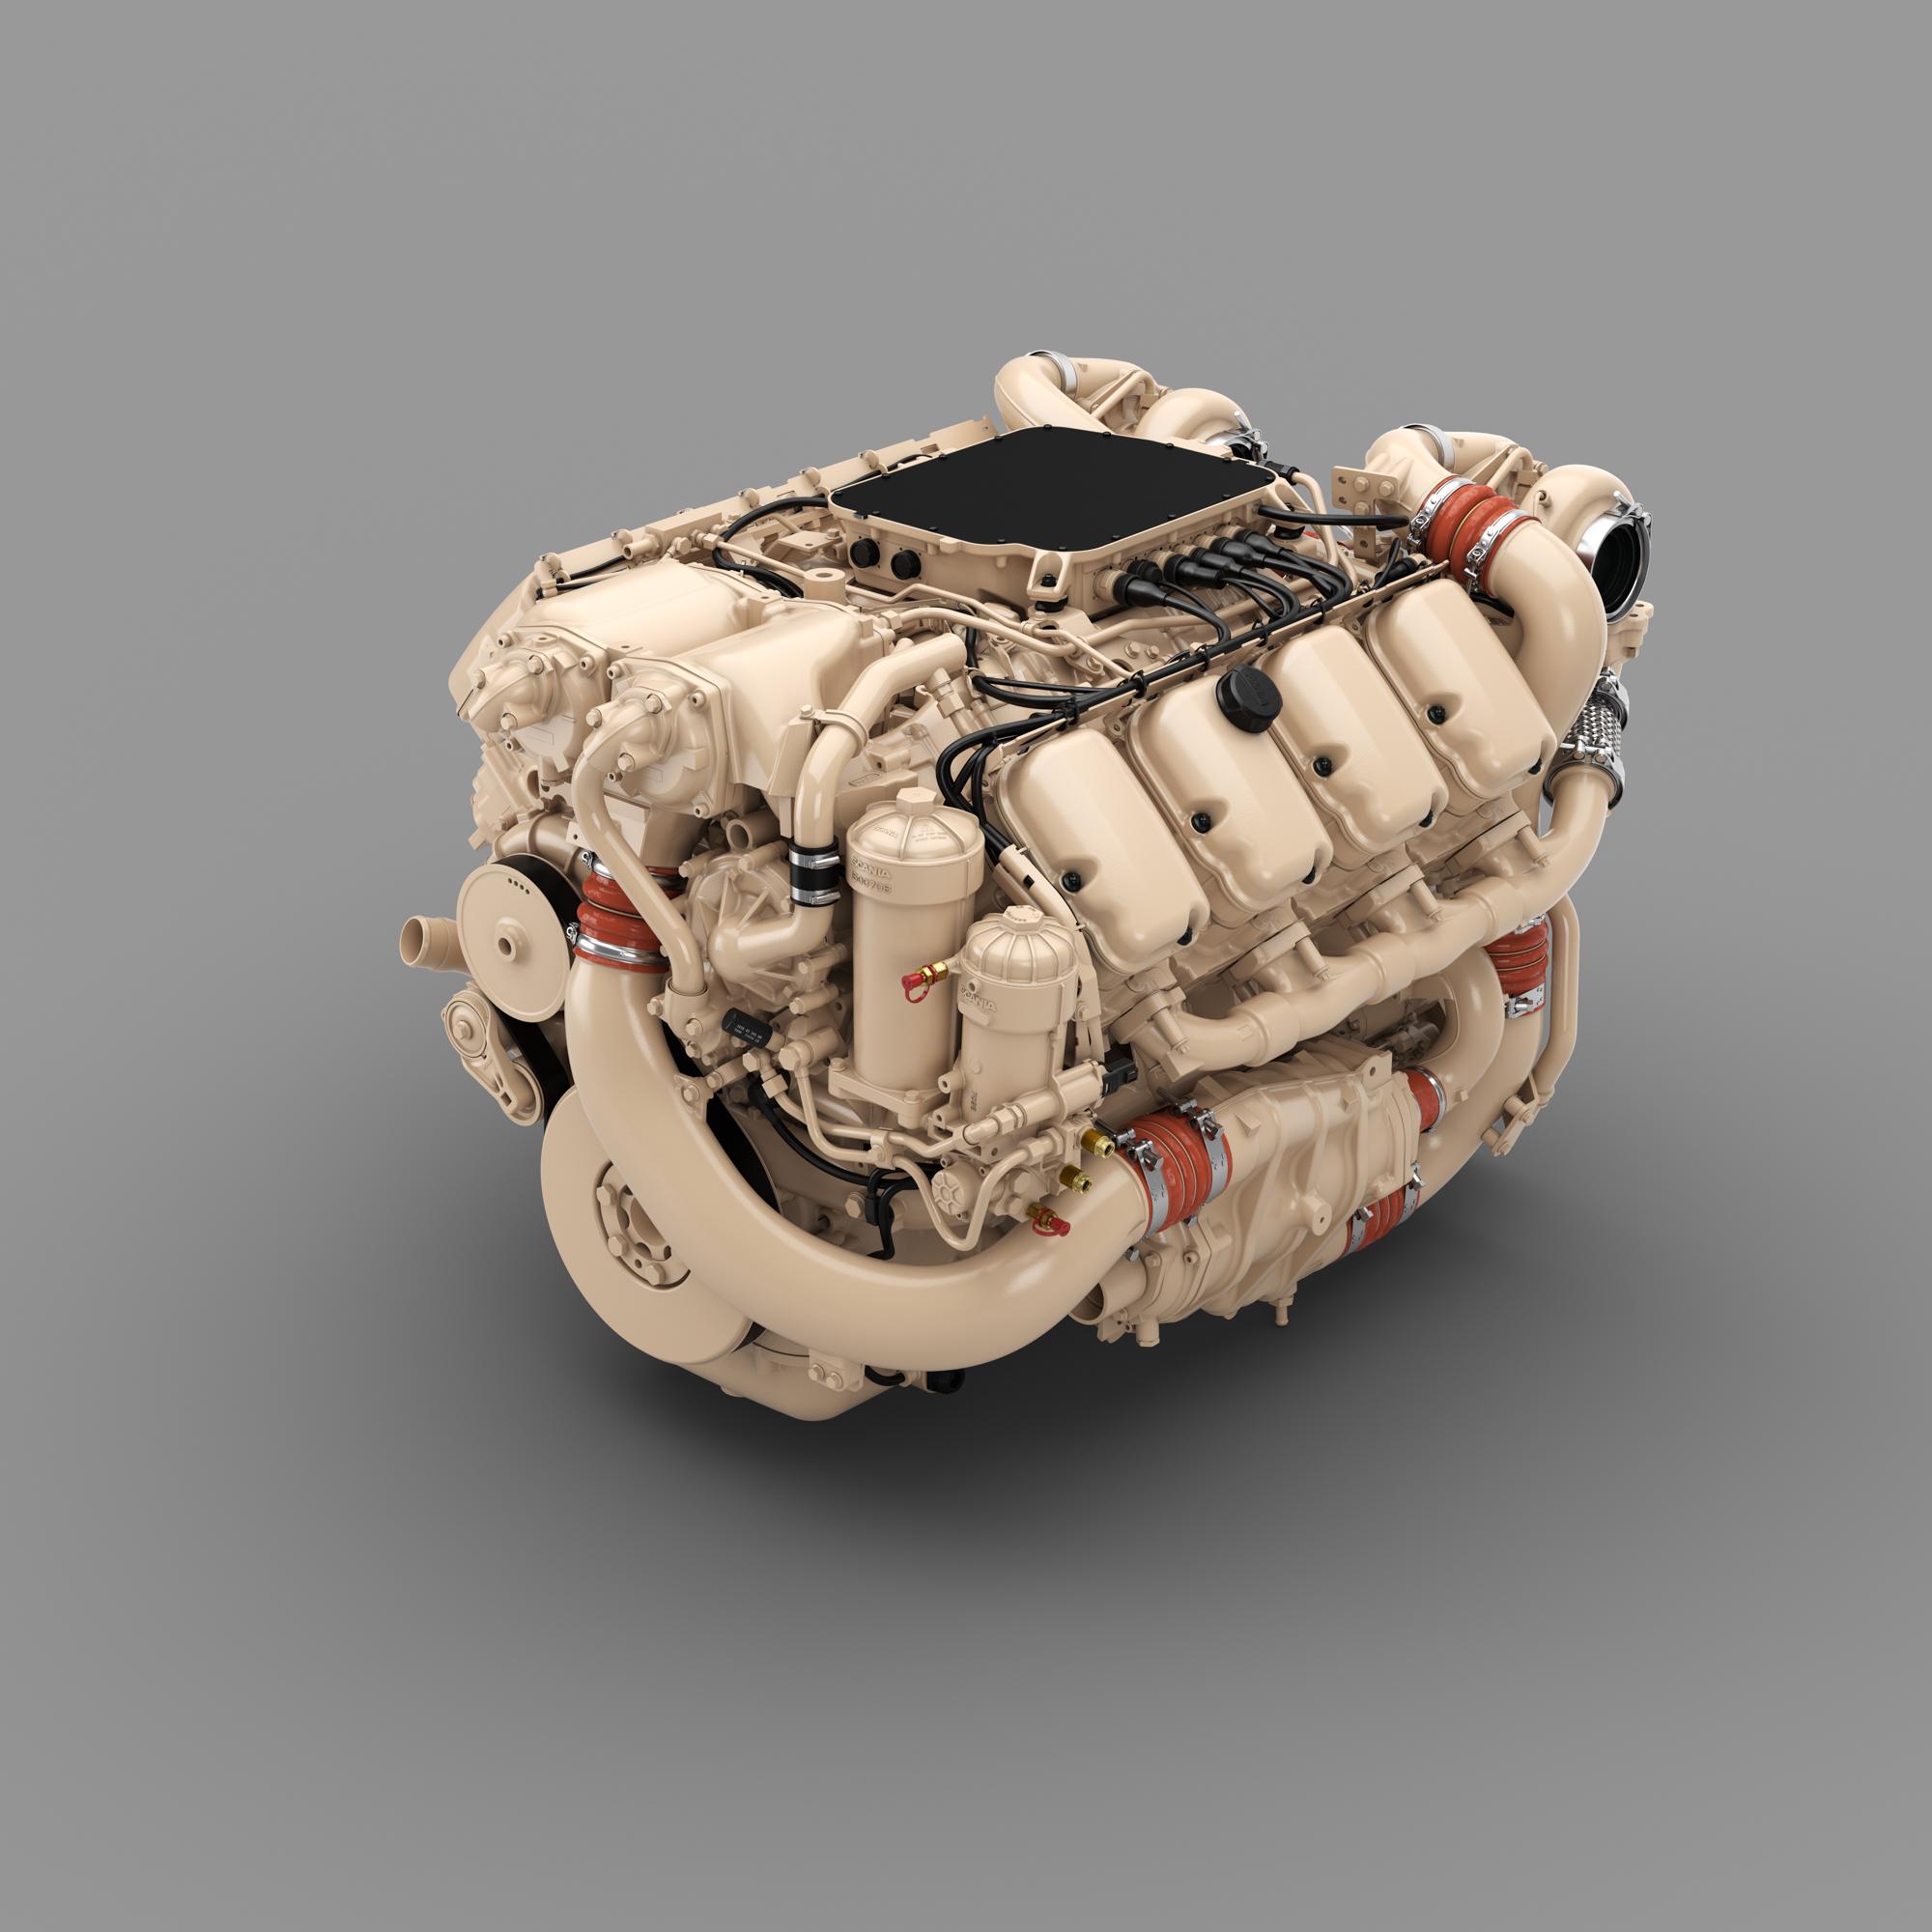 Scania_Engine_006.JPG